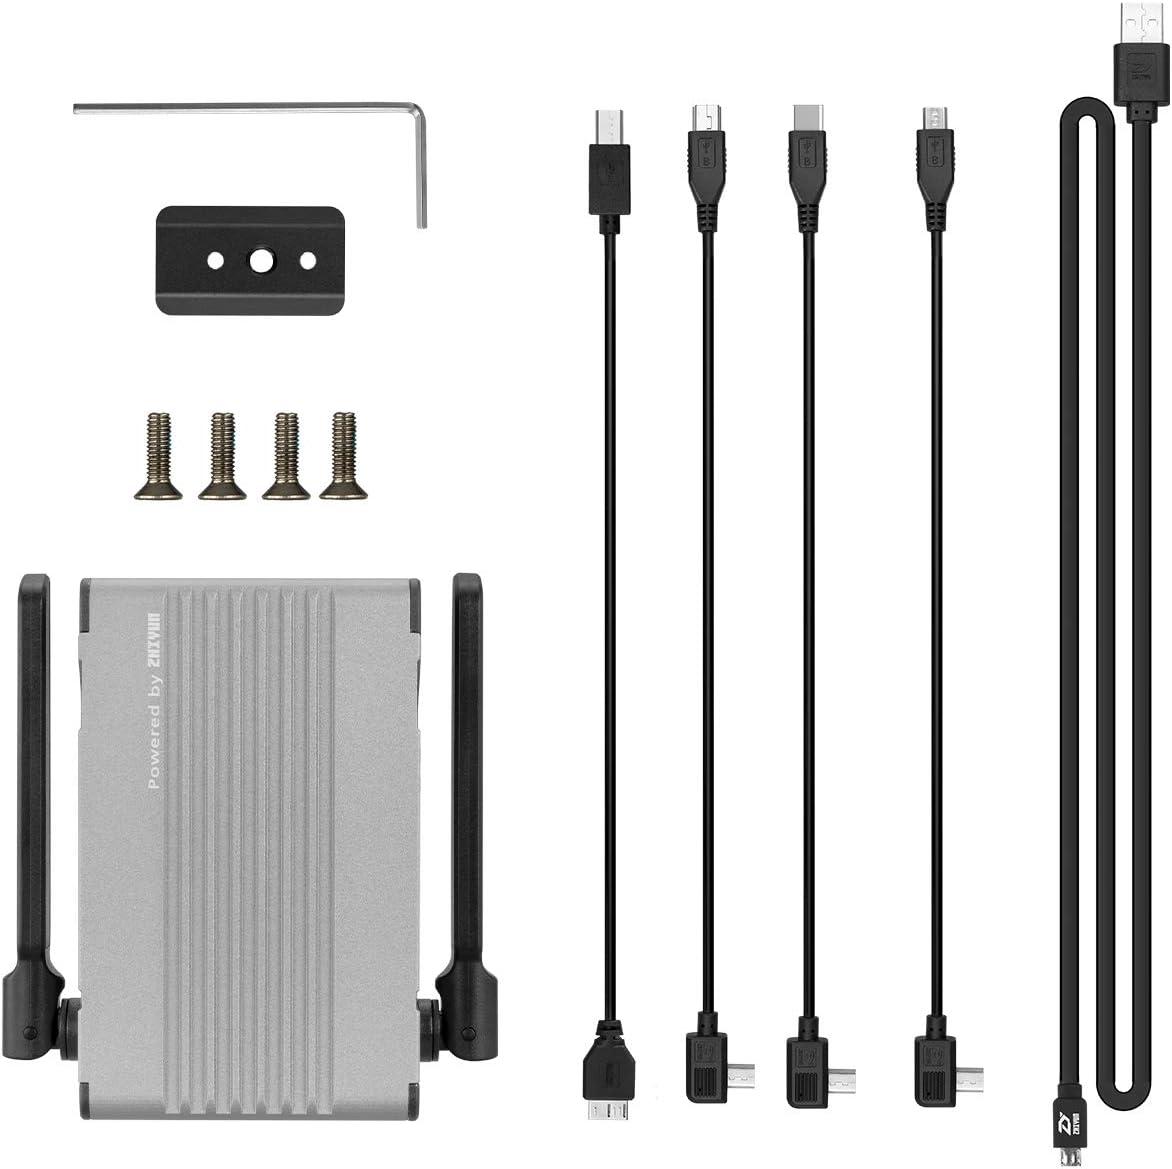 A Crane 3 Include Image Transmission Line ZHIYUN TransMount Image Transmission Transmitter 1080P HD Image Transmission for WEEBILL S Stablizer//Crane 2